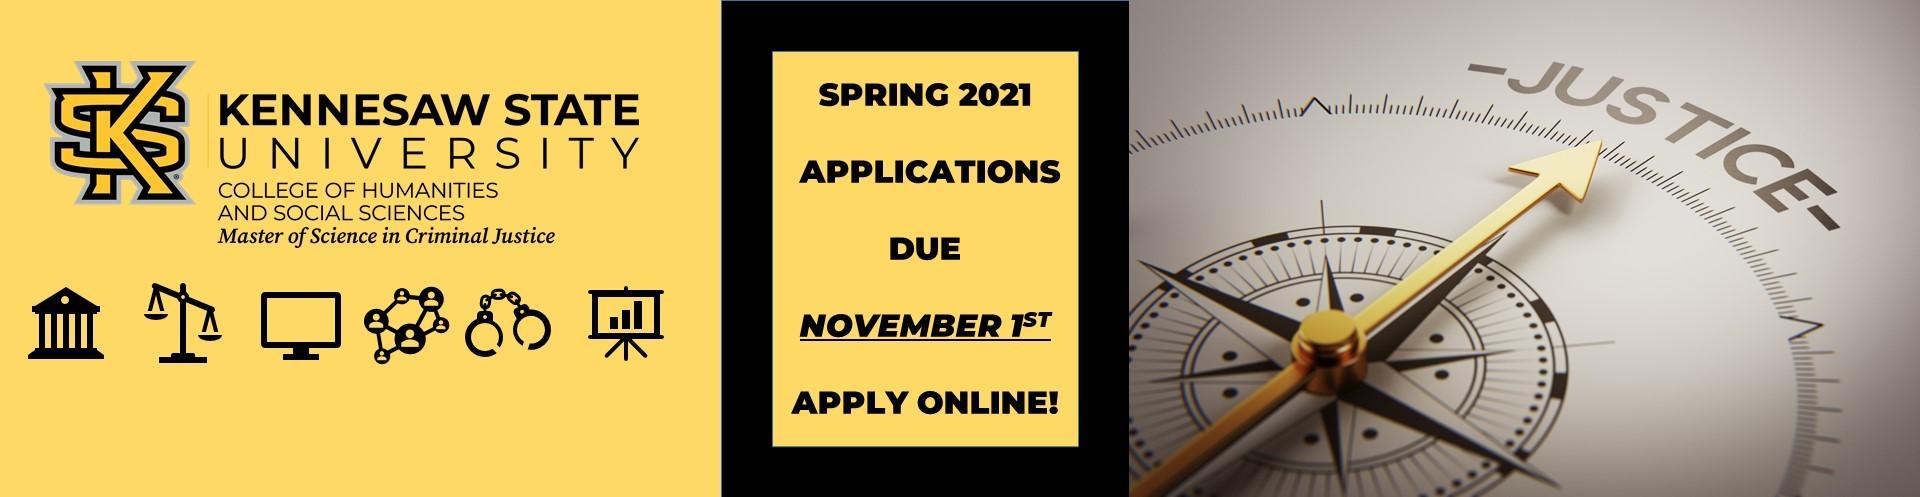 Apply online to the MSCJ Program